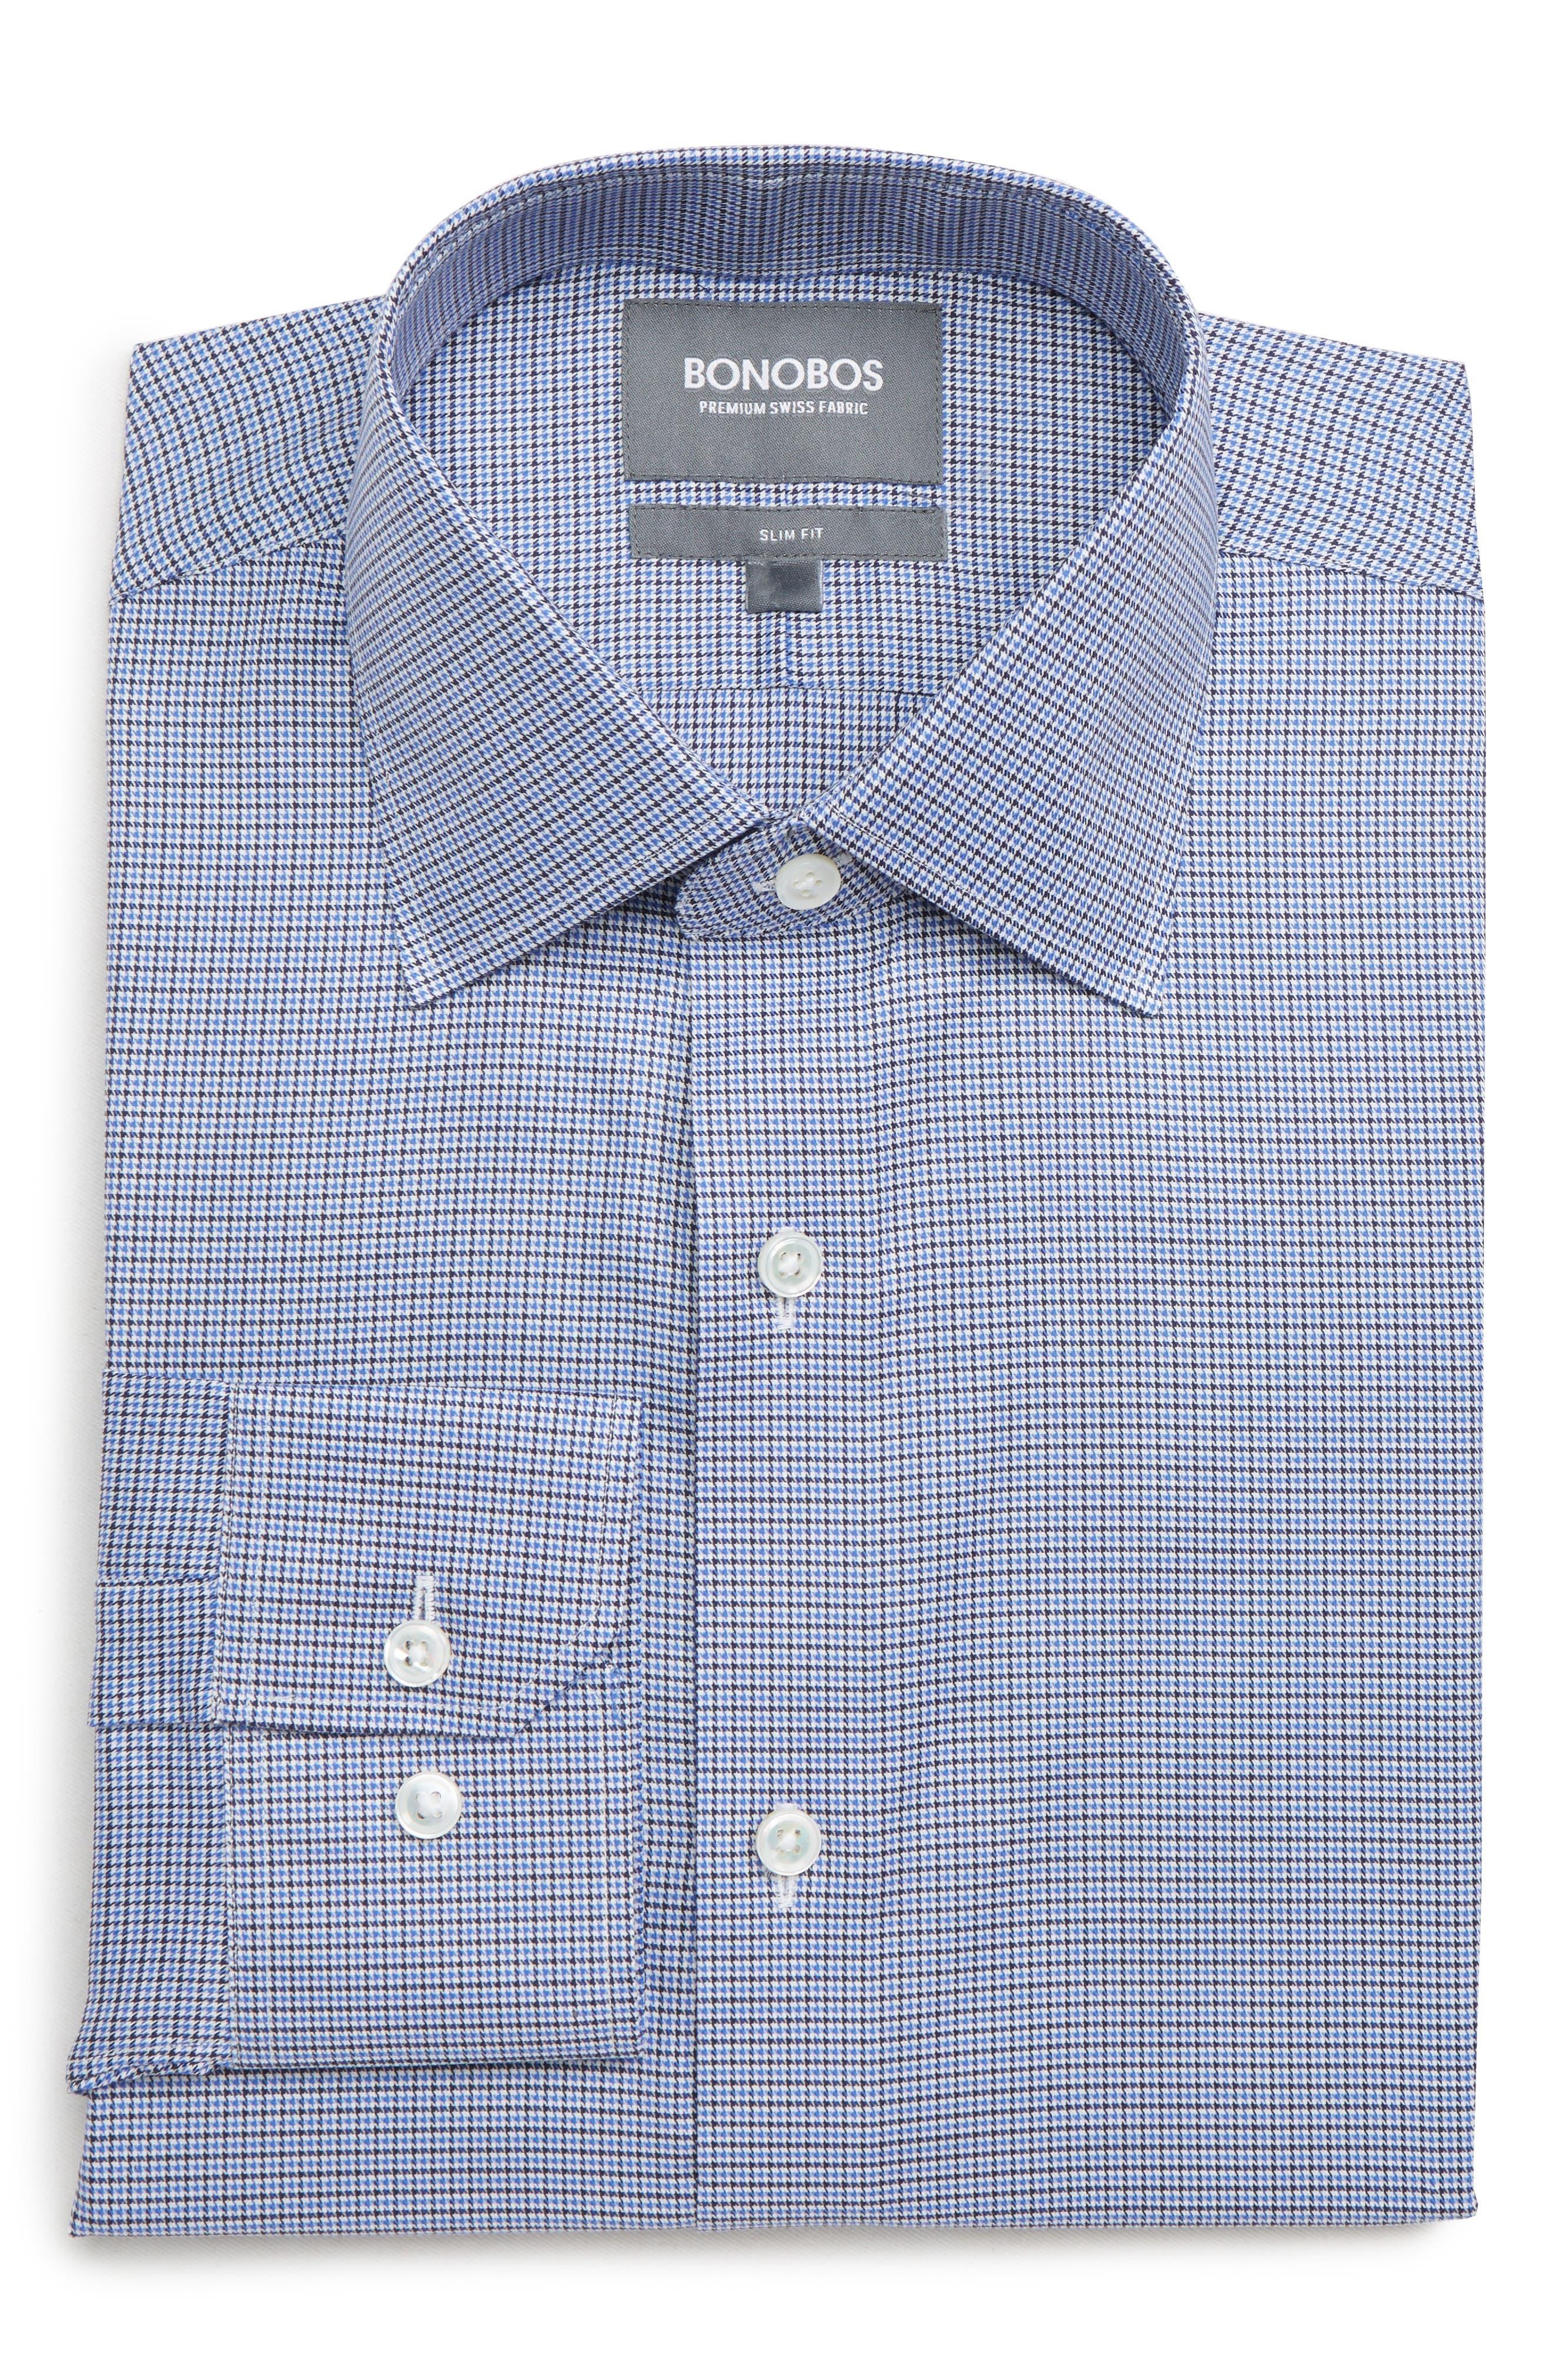 Efford Slim Fit Check Dress Shirt,                             Main thumbnail 1, color,                             MARINE